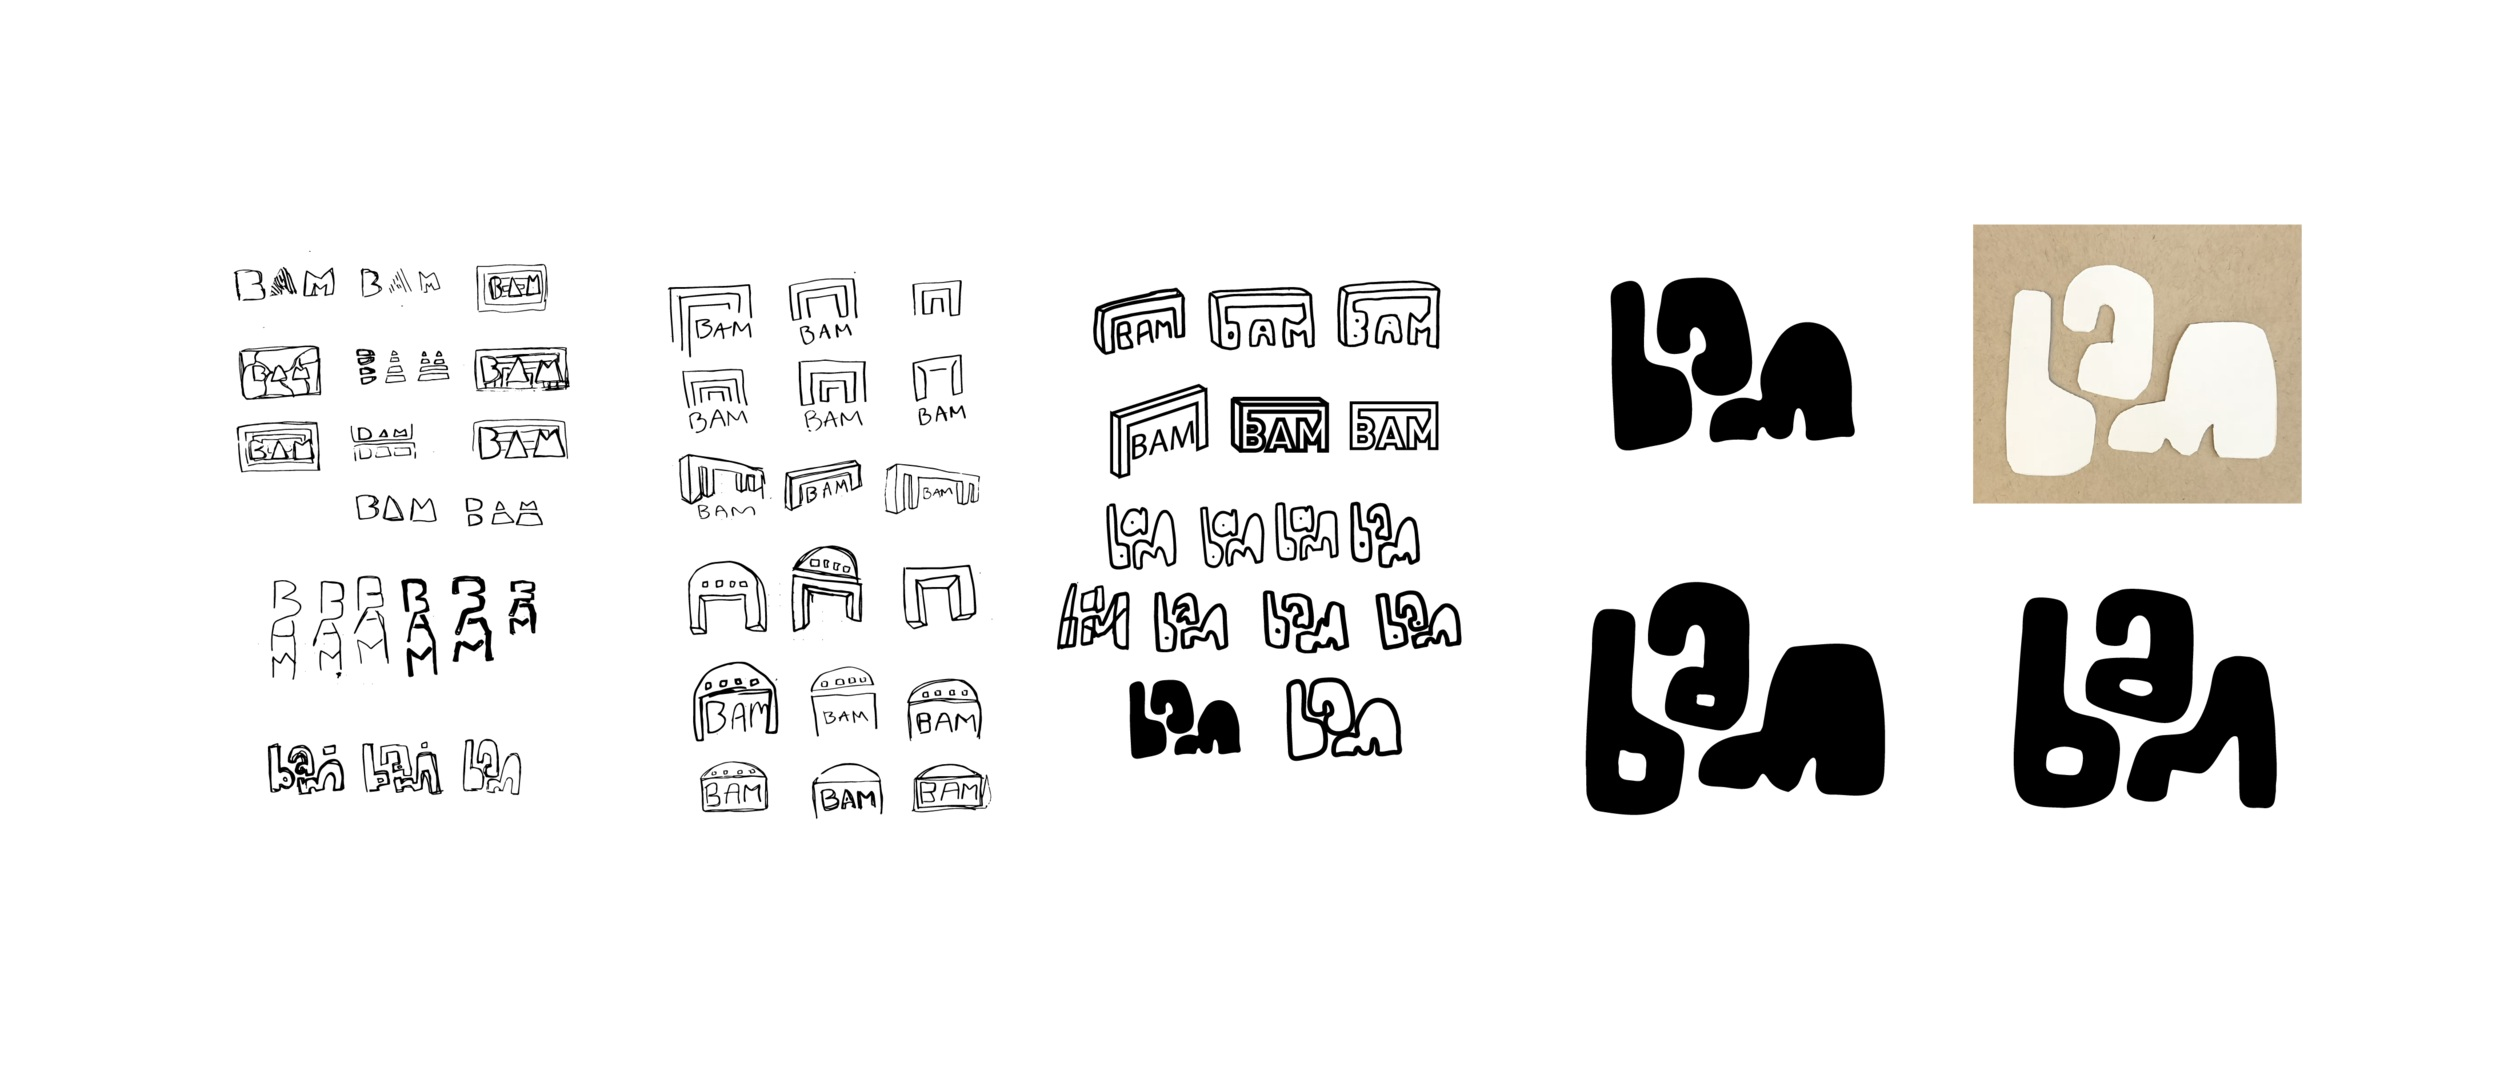 bamalogoprocess-03.jpg